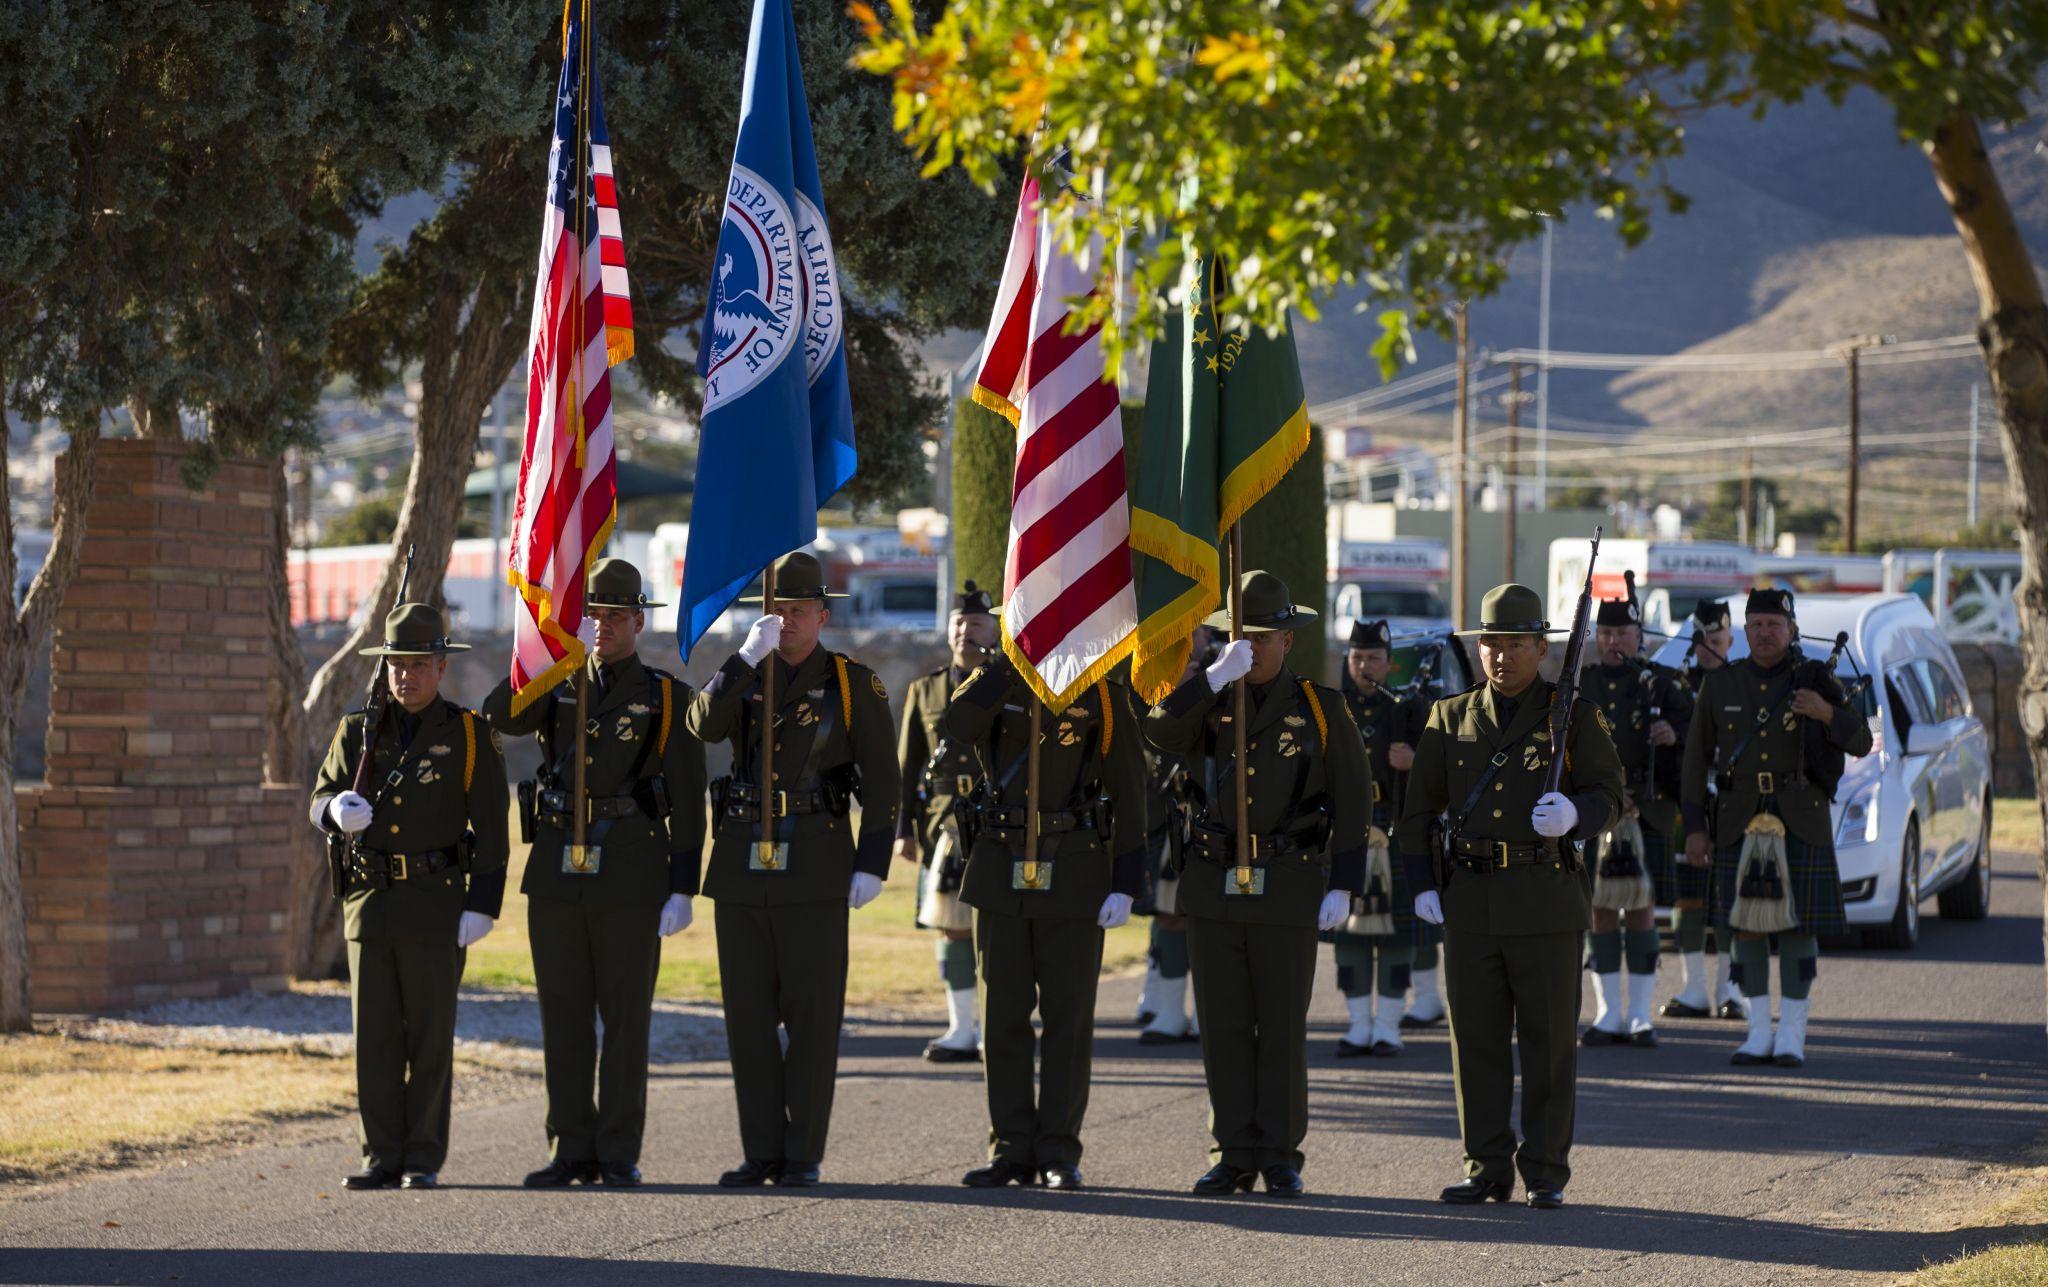 Funeral For Border Patrol Agent Held In El Paso San